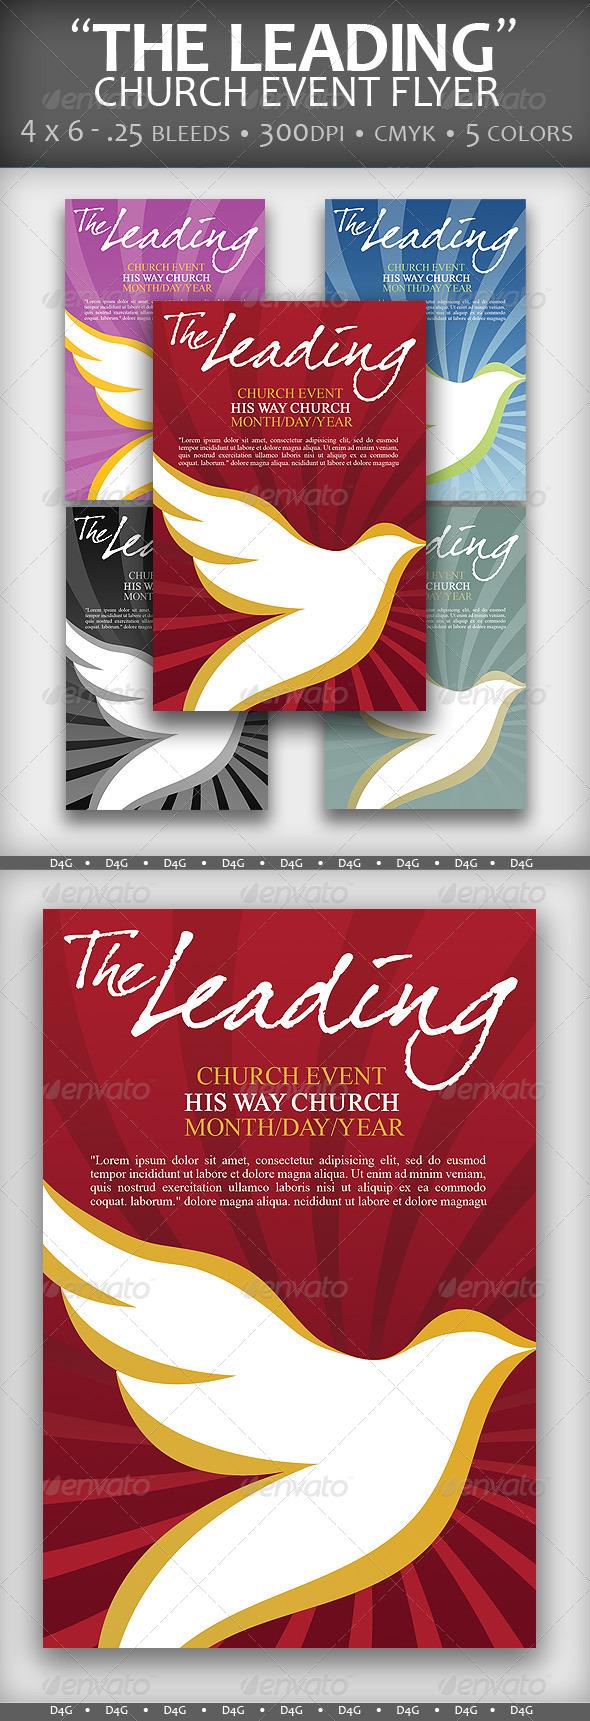 """The Leading"" Church Event Flyer - Church Flyers"